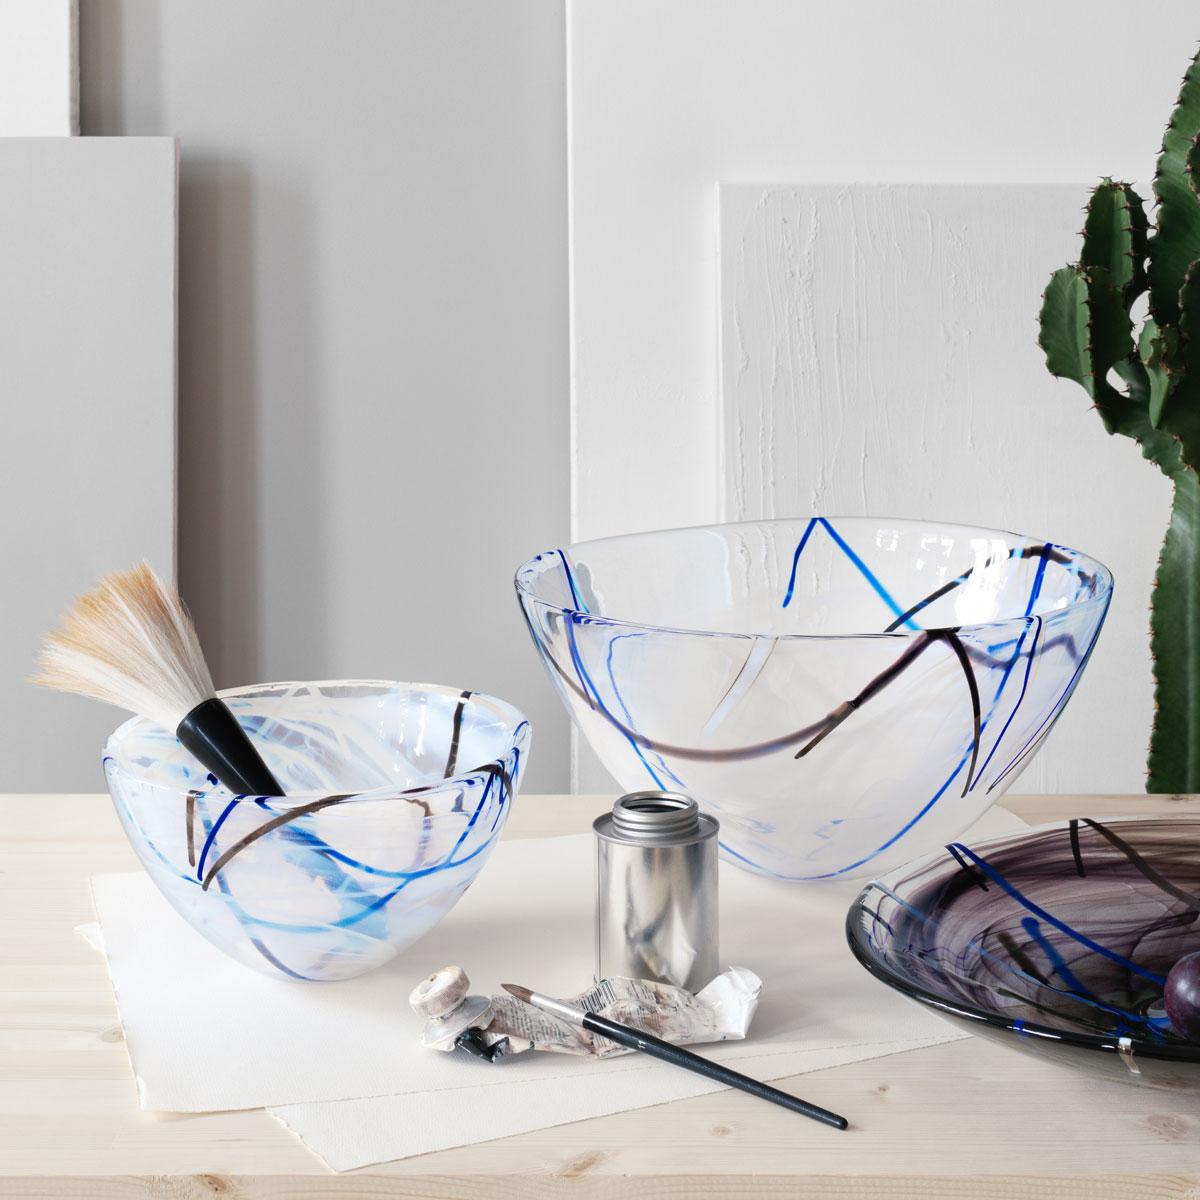 Kosta Boda Contrast Small Crystal Bowl, White